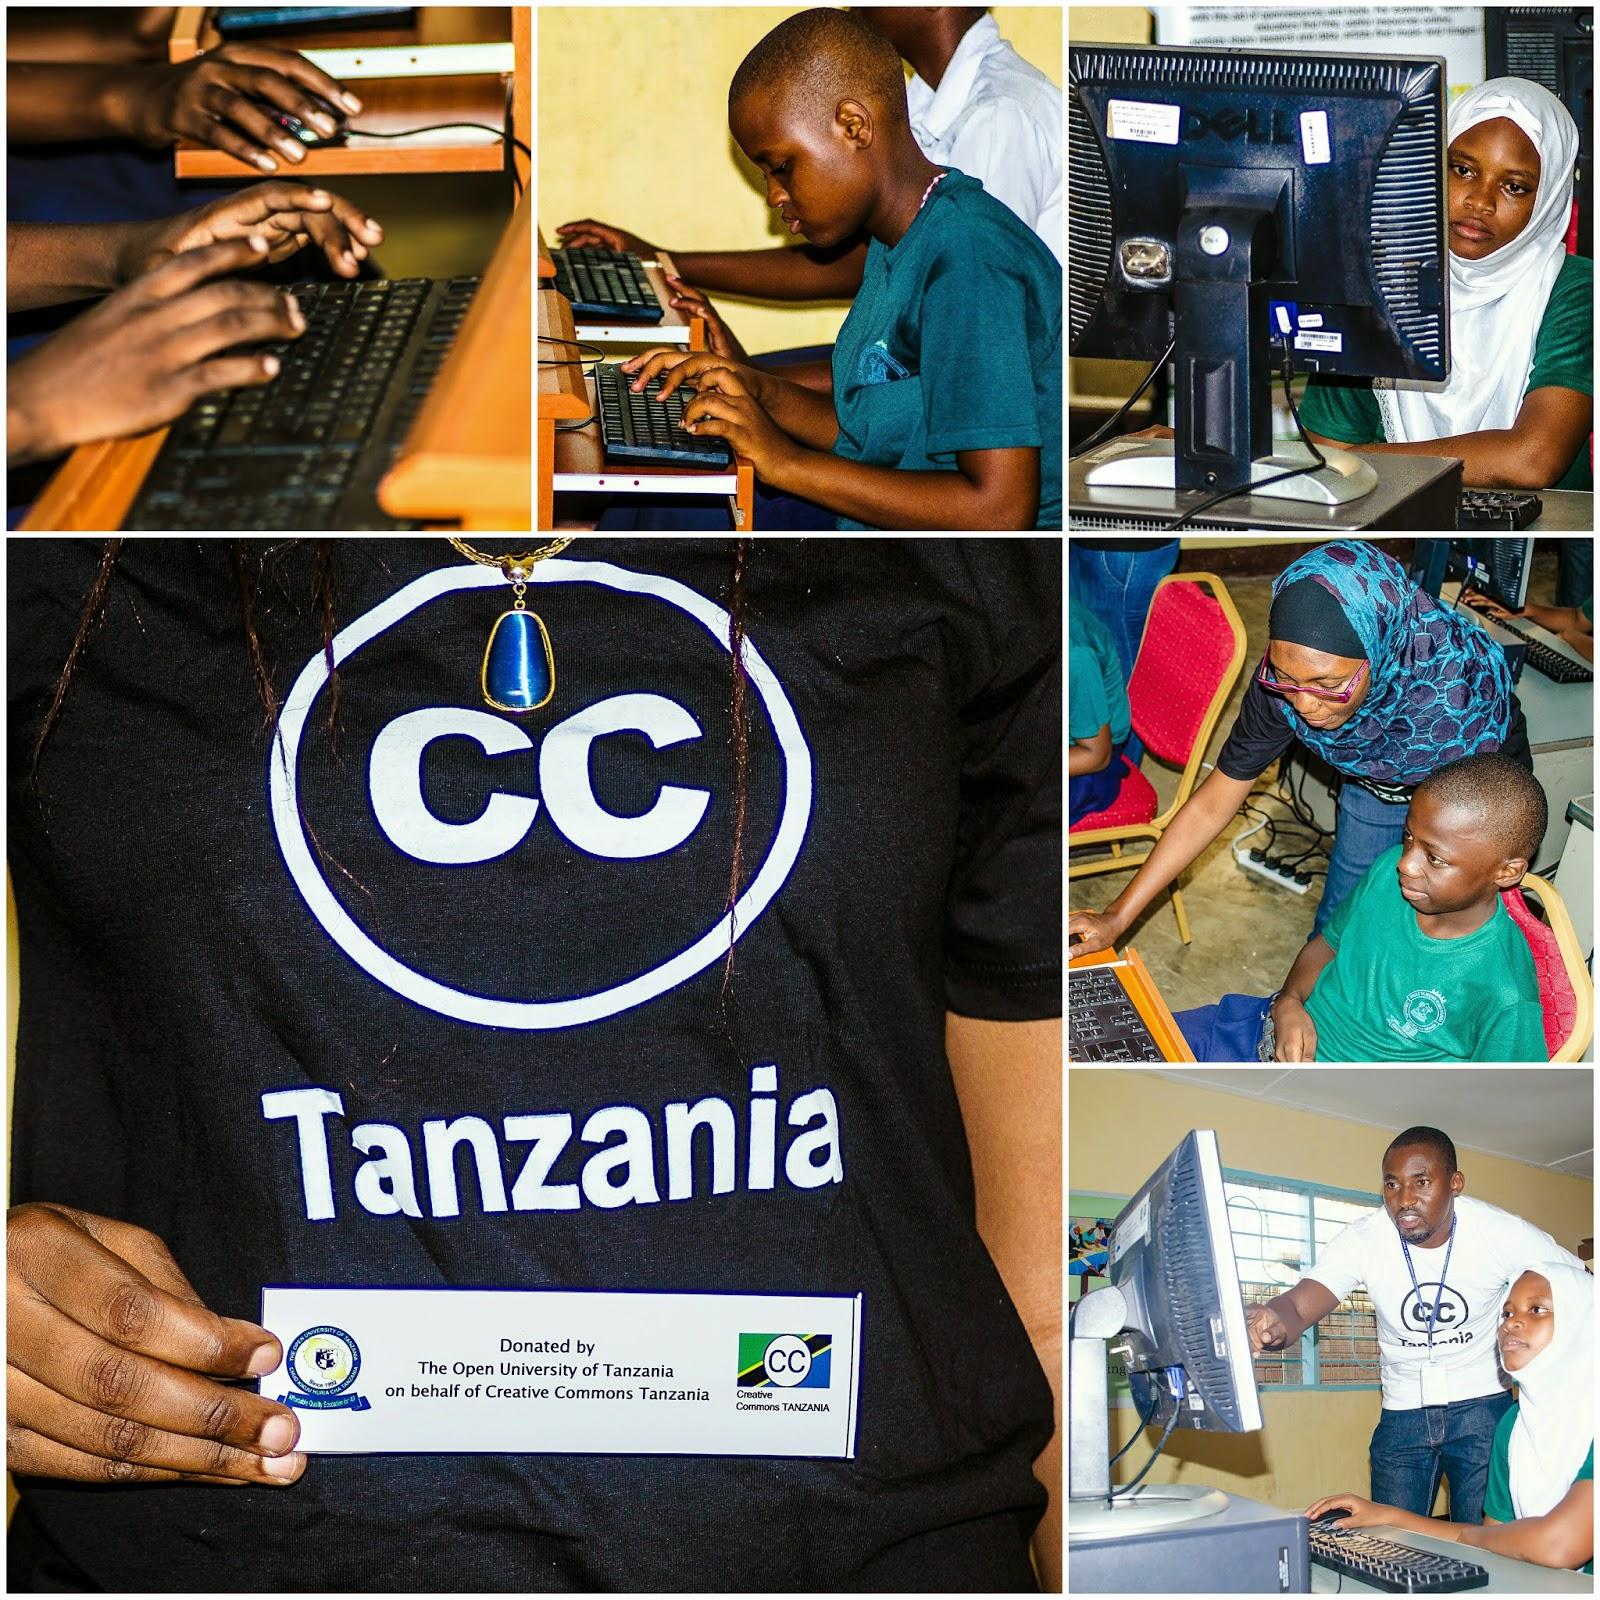 Cc Tanzania